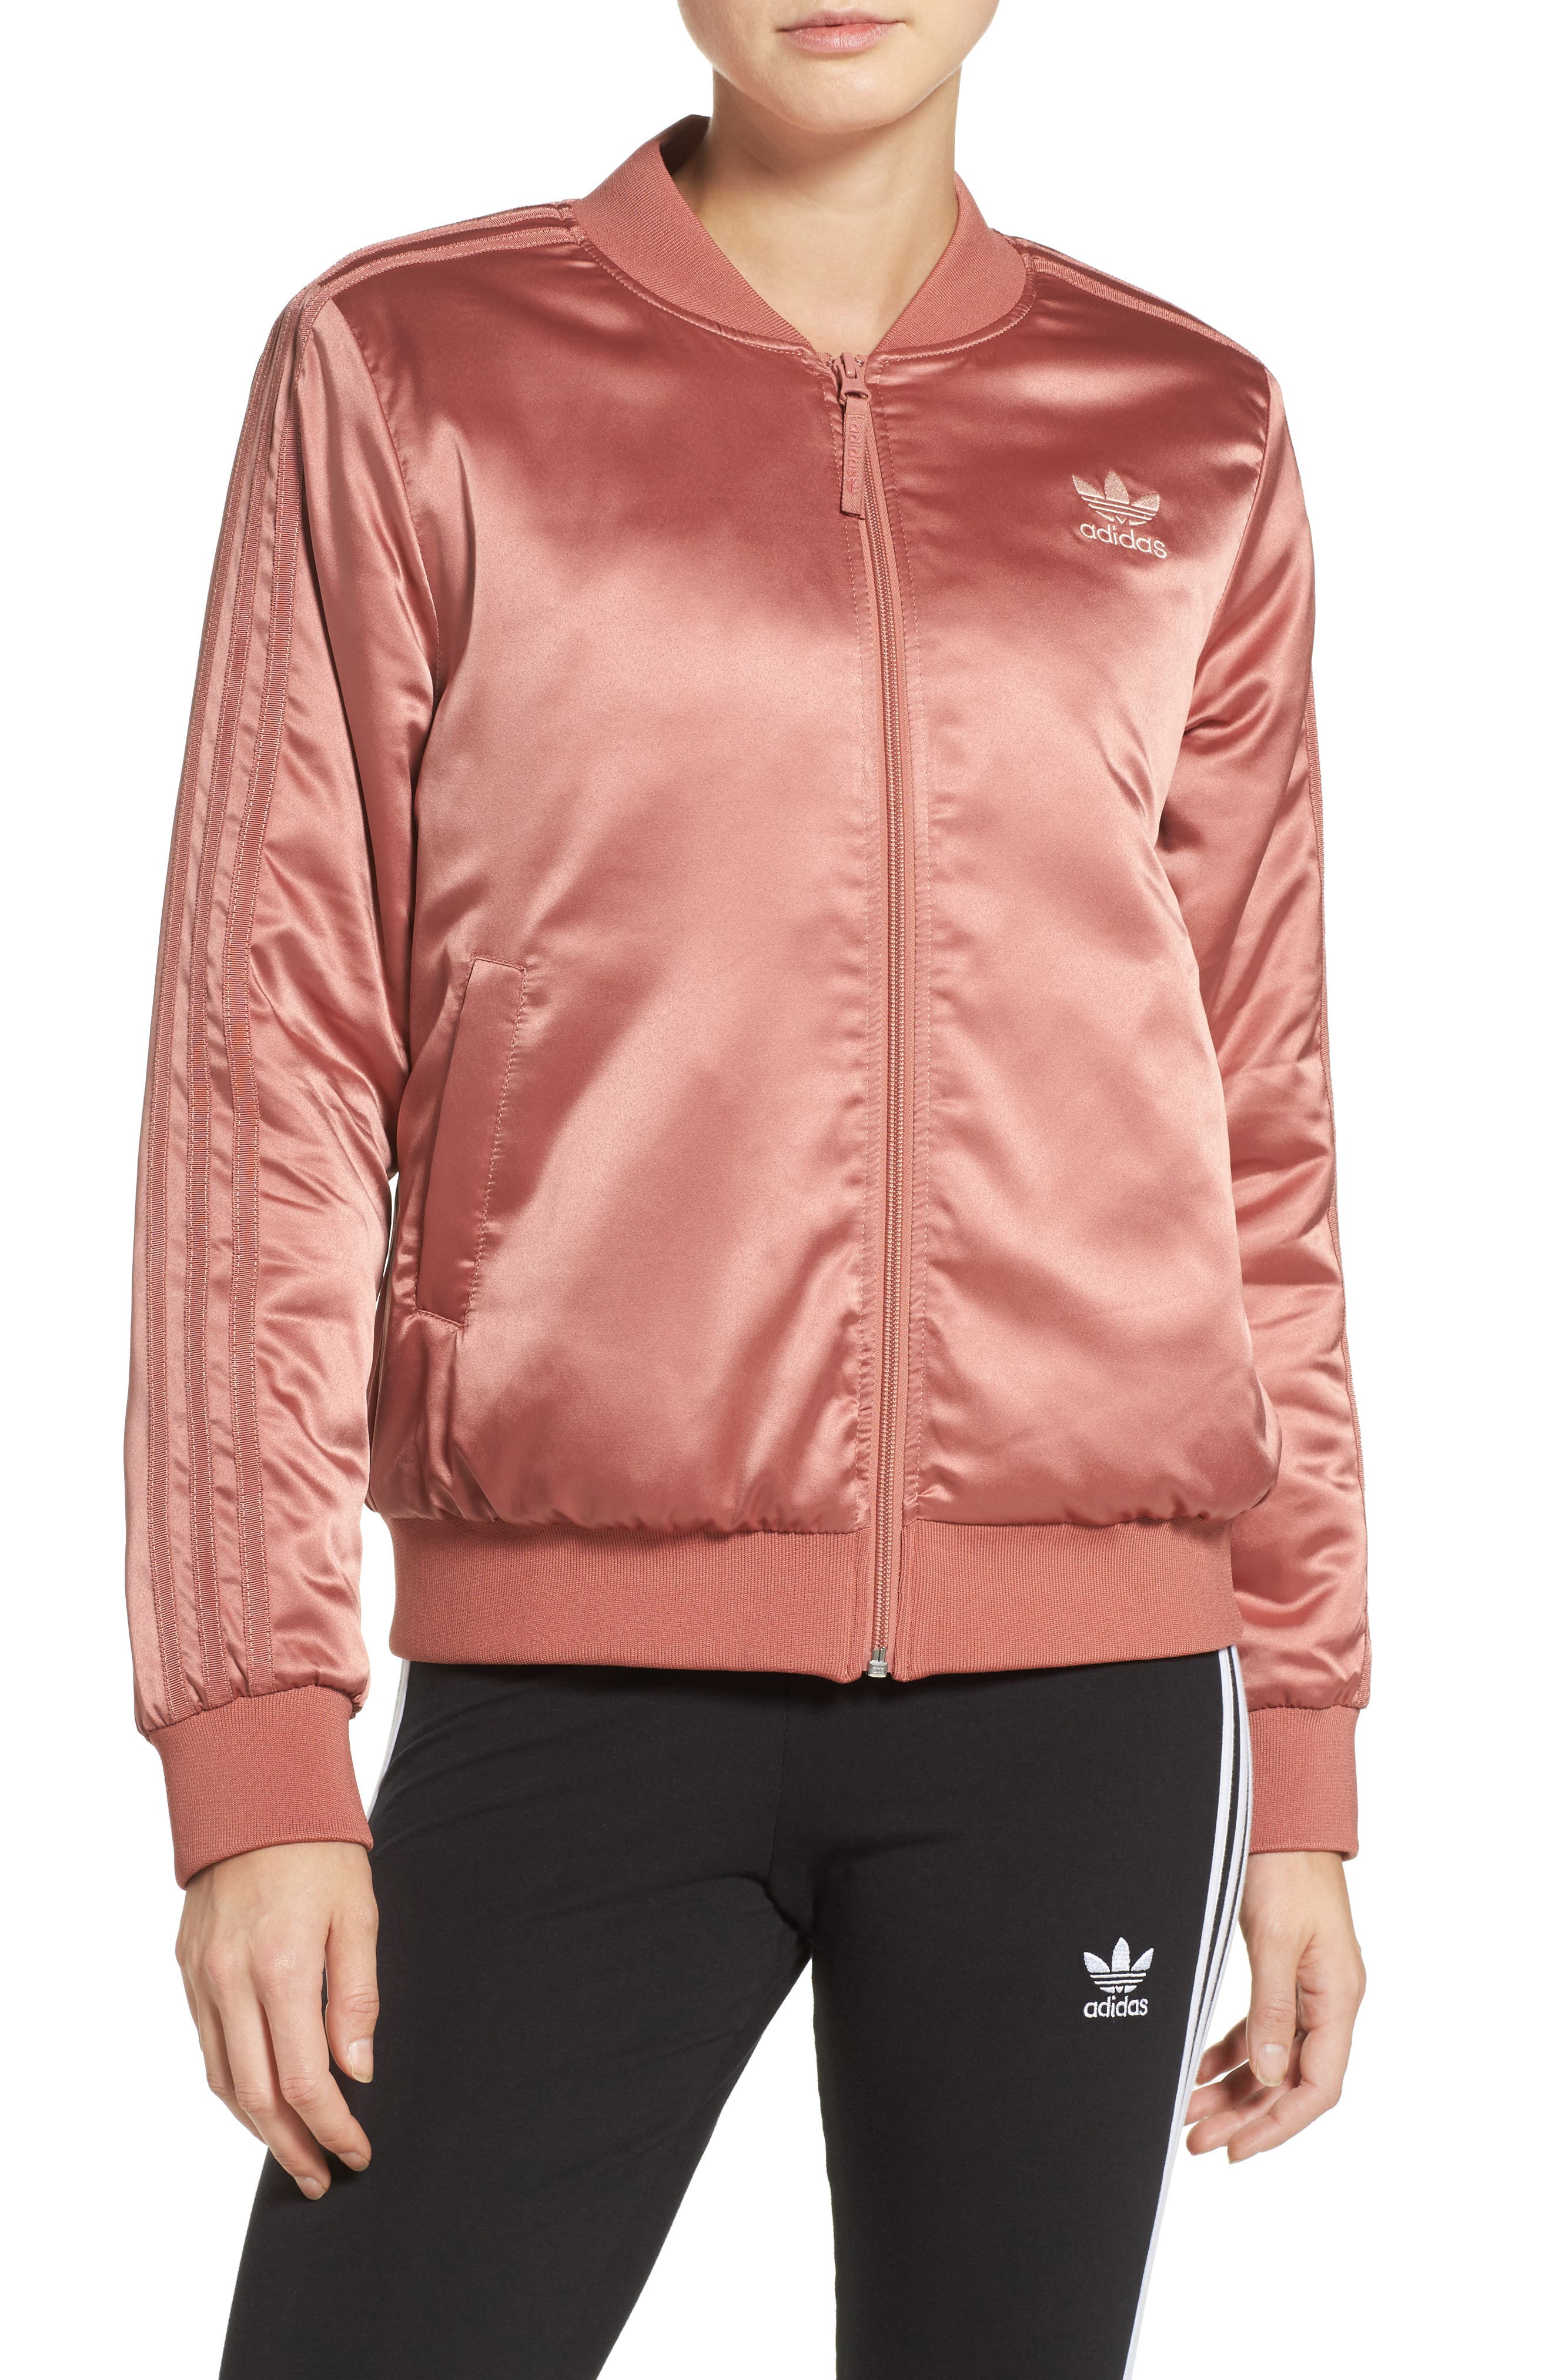 Main Image - adidas Originals Trefoil Satin Jacket